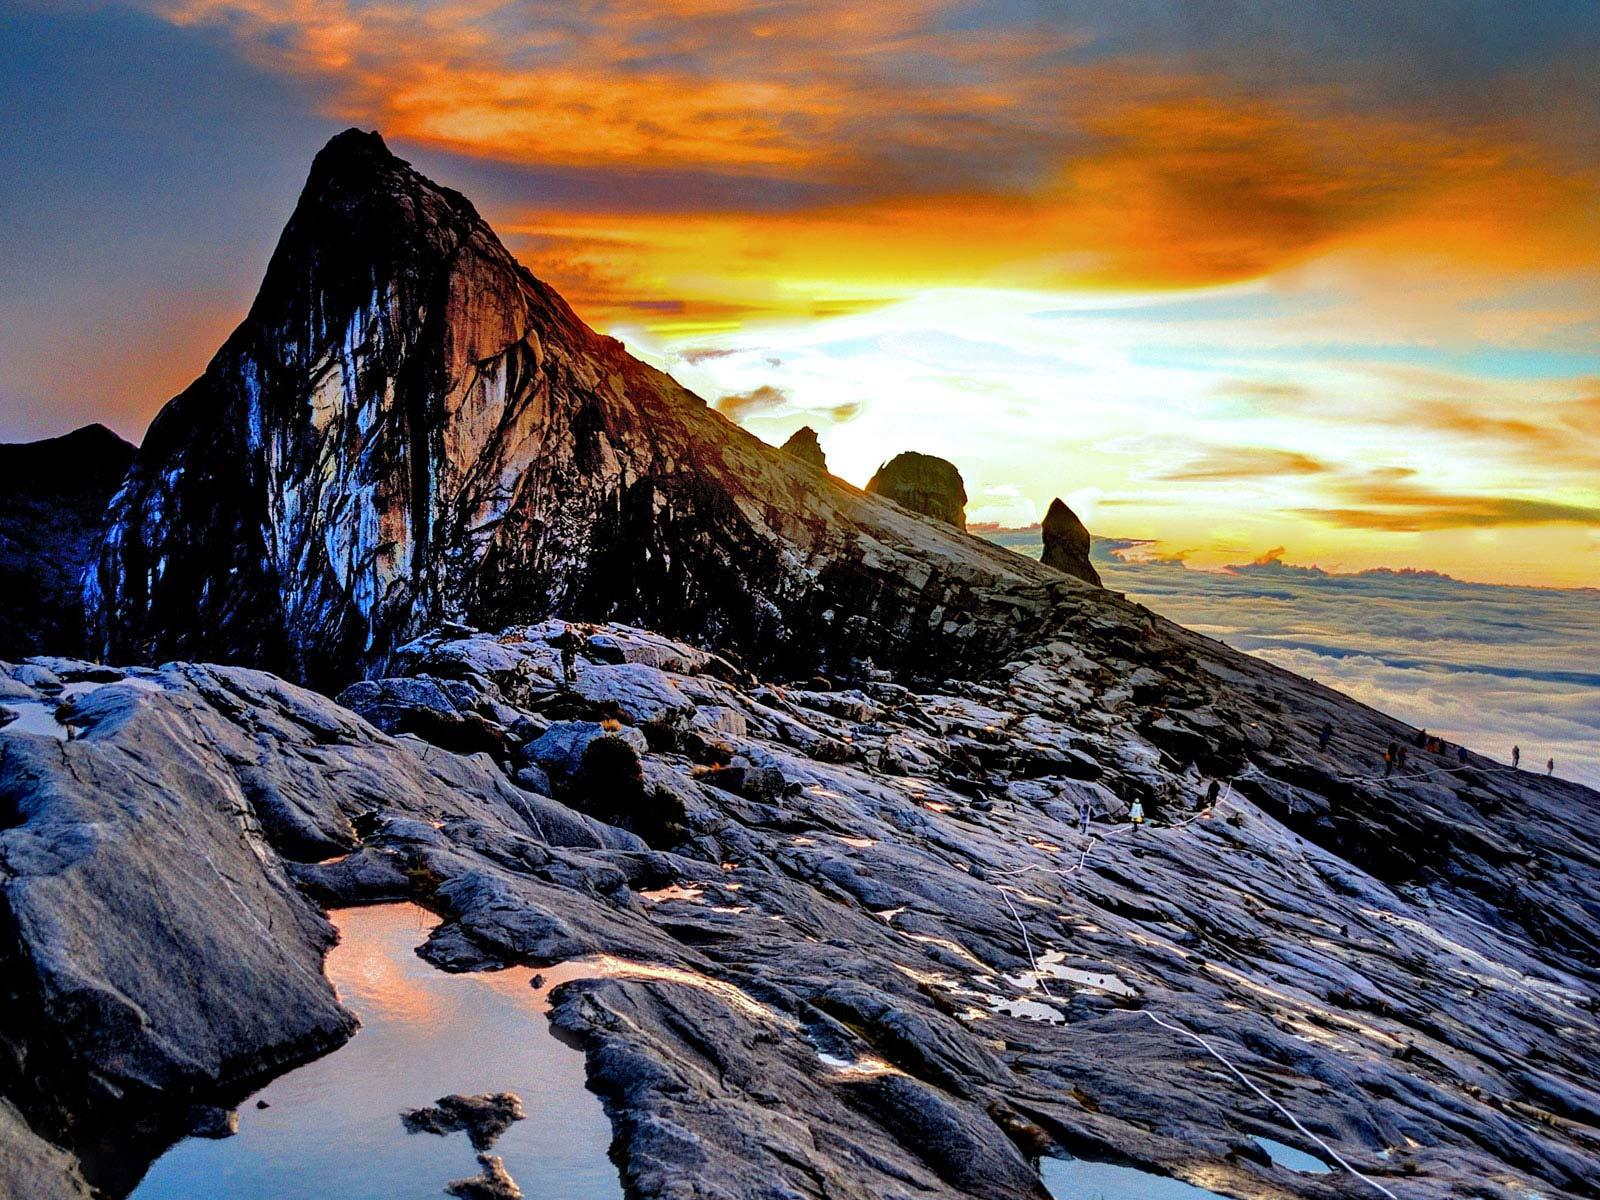 Mount Kinabalu (4,093 m) the highest mountain of Malaysia